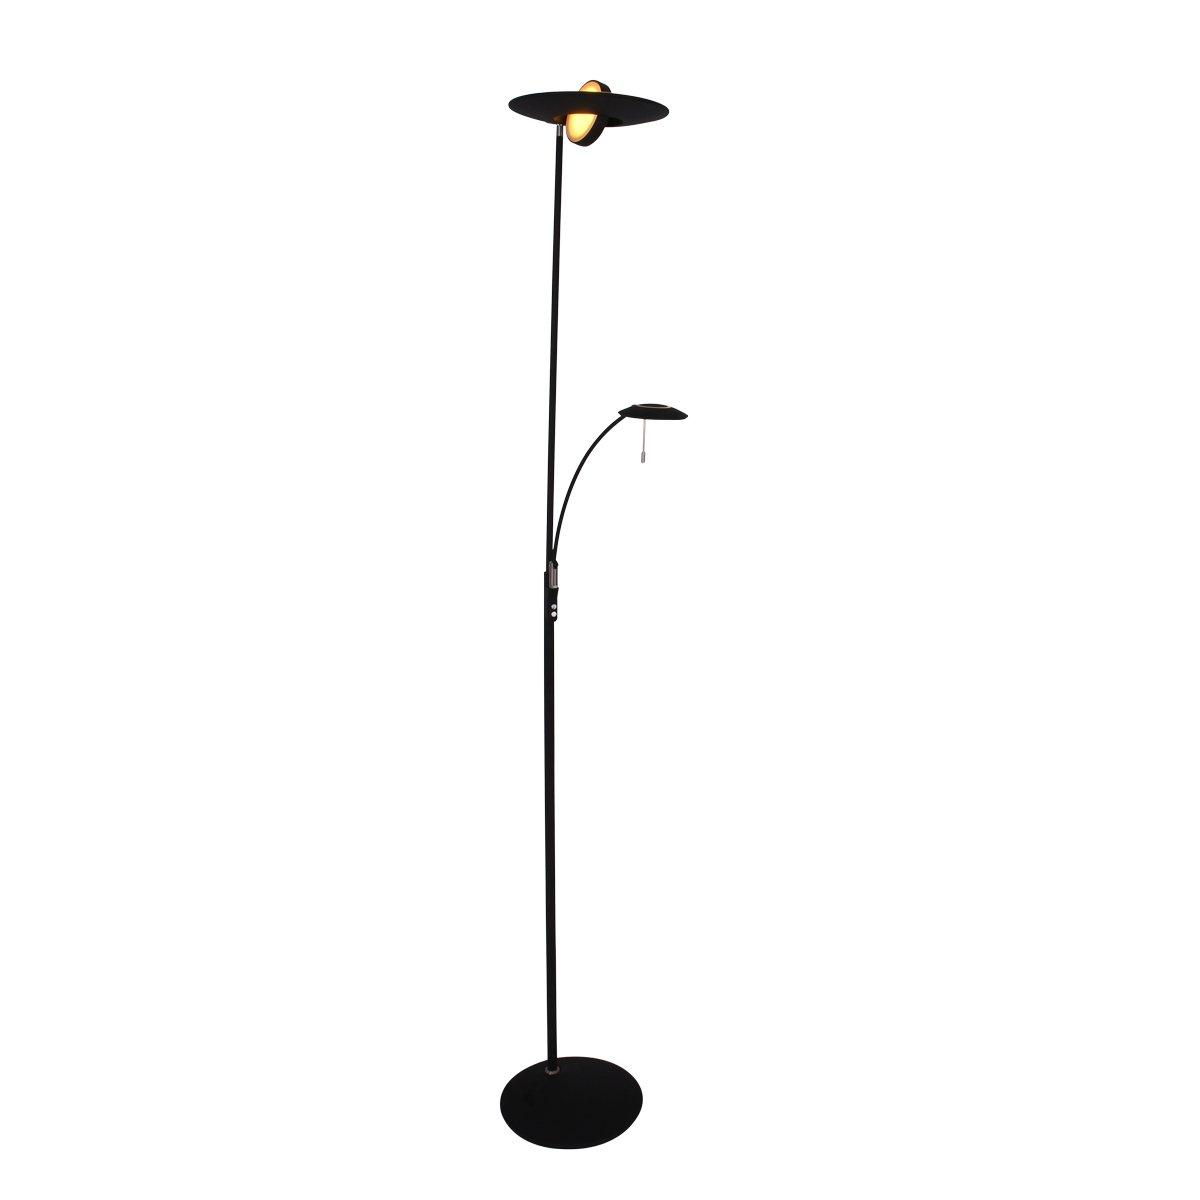 Vloerlamp Steinhauer Zenith Zwart Uplight Met Leesarm